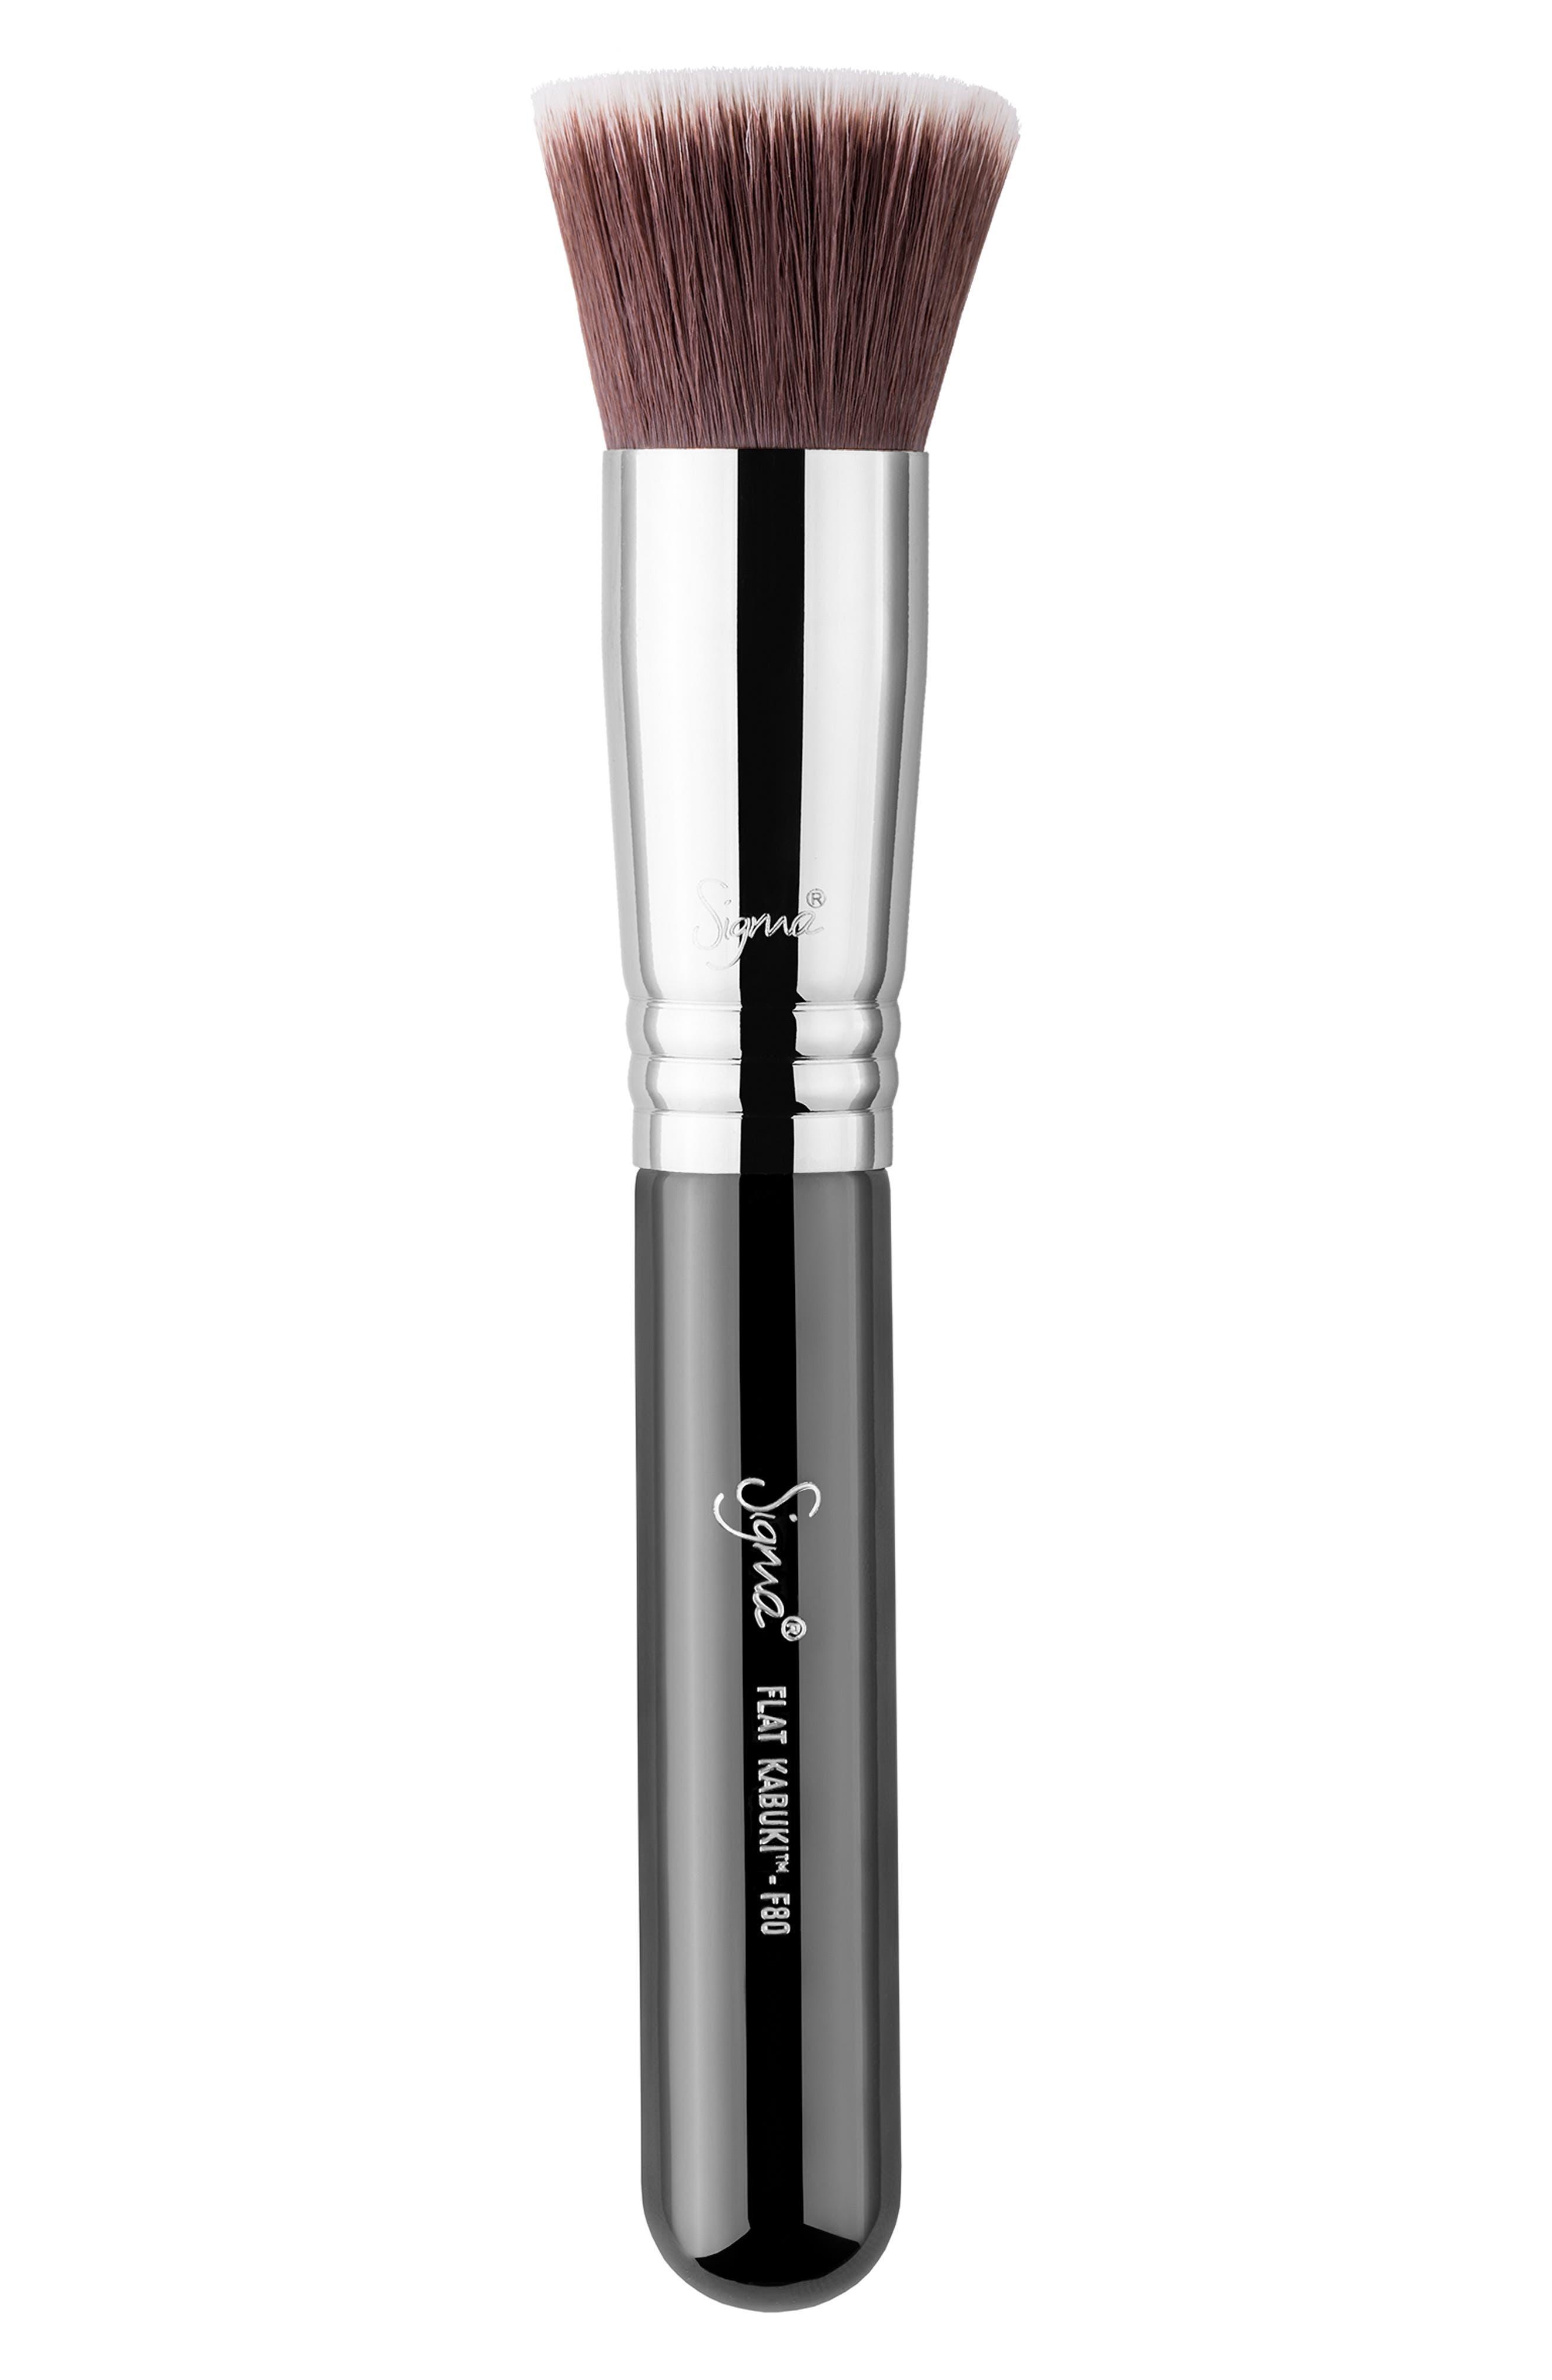 Main Image - Sigma Beauty F80 Flat Kabuki™ Brush